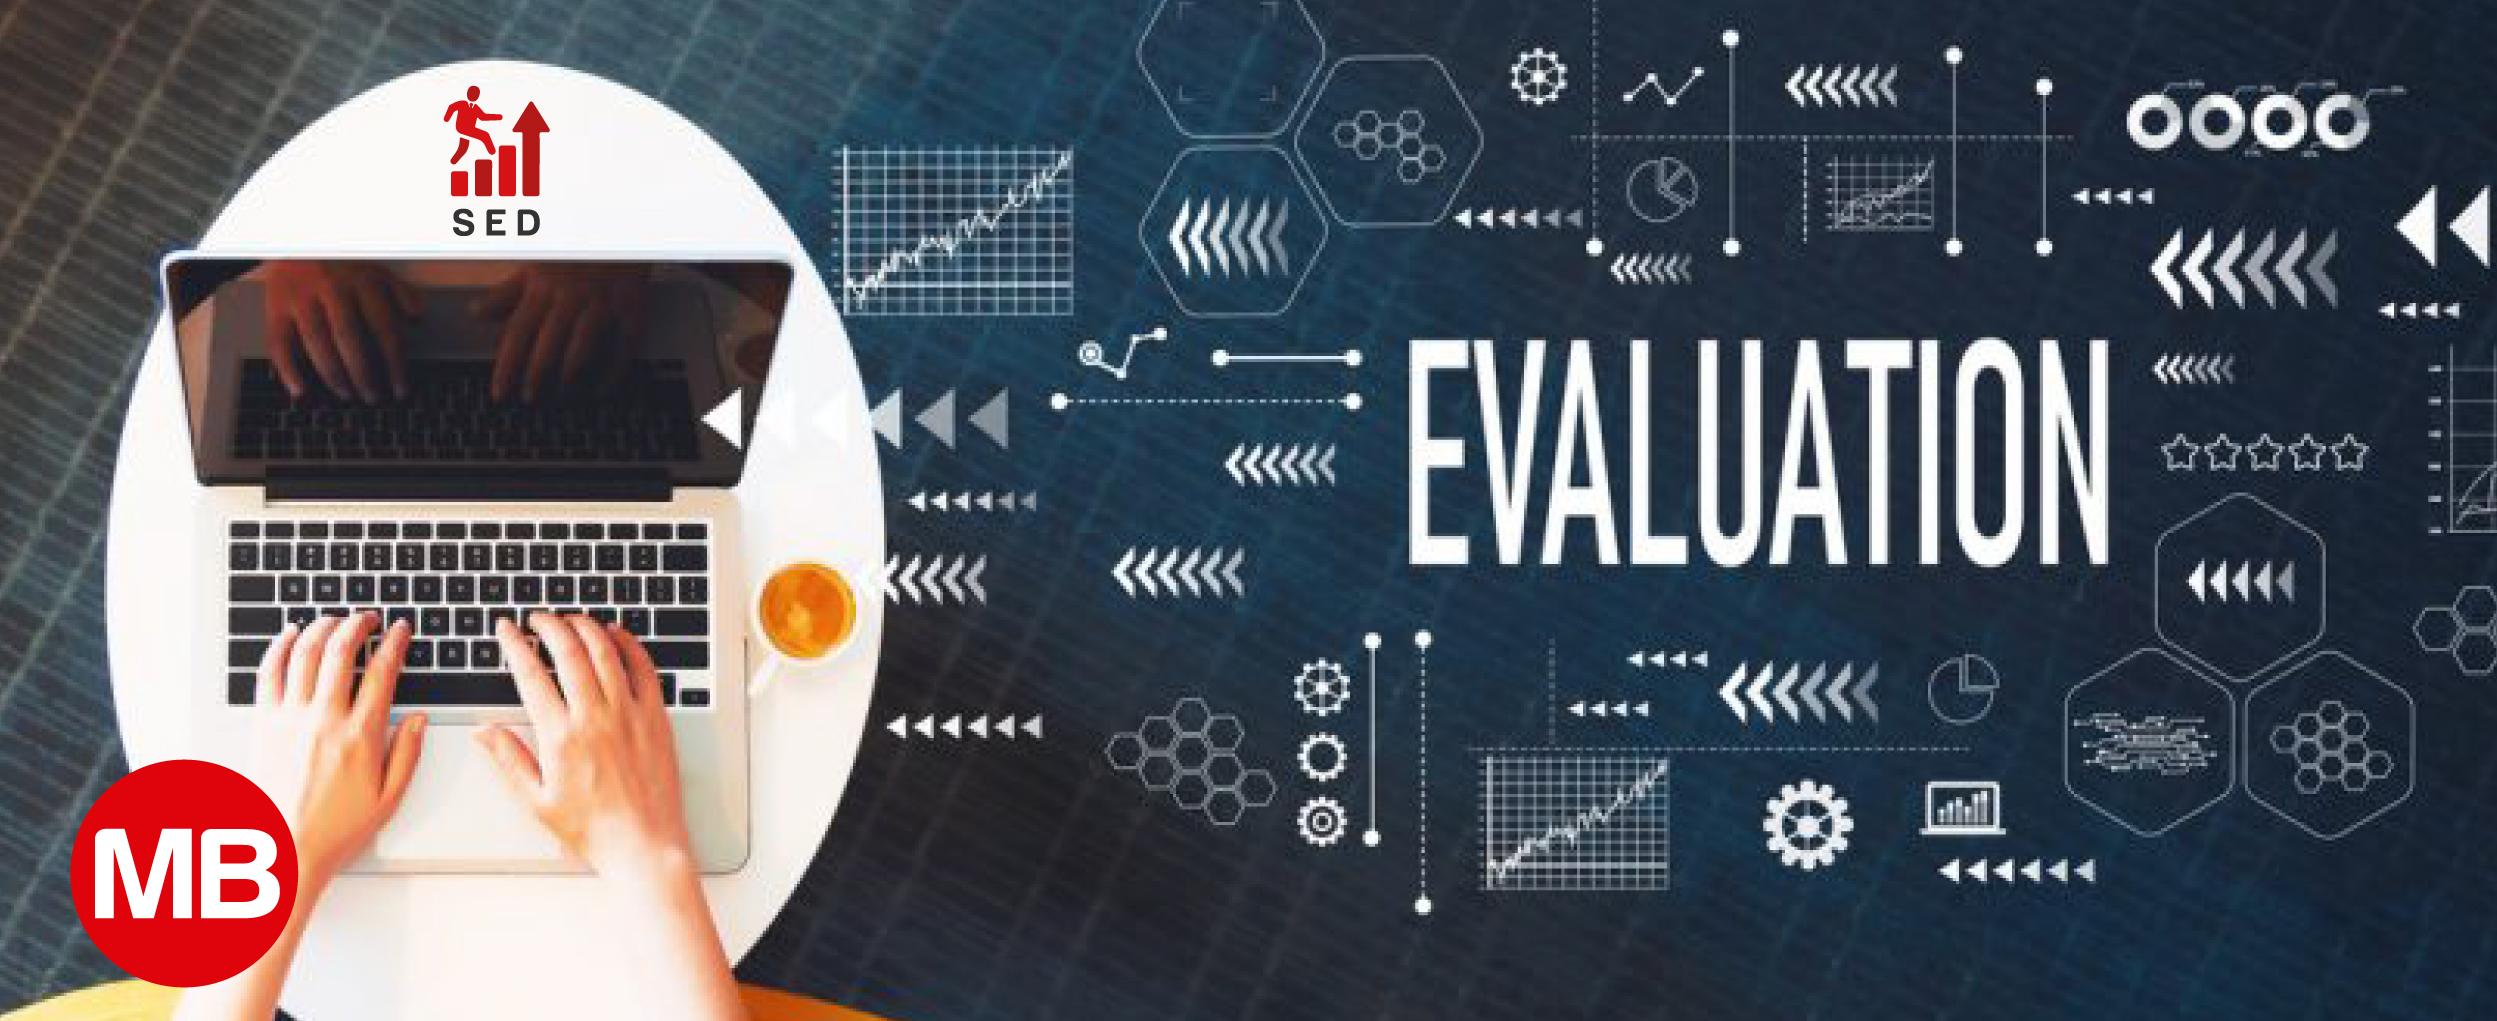 Evaluation-01.jpg